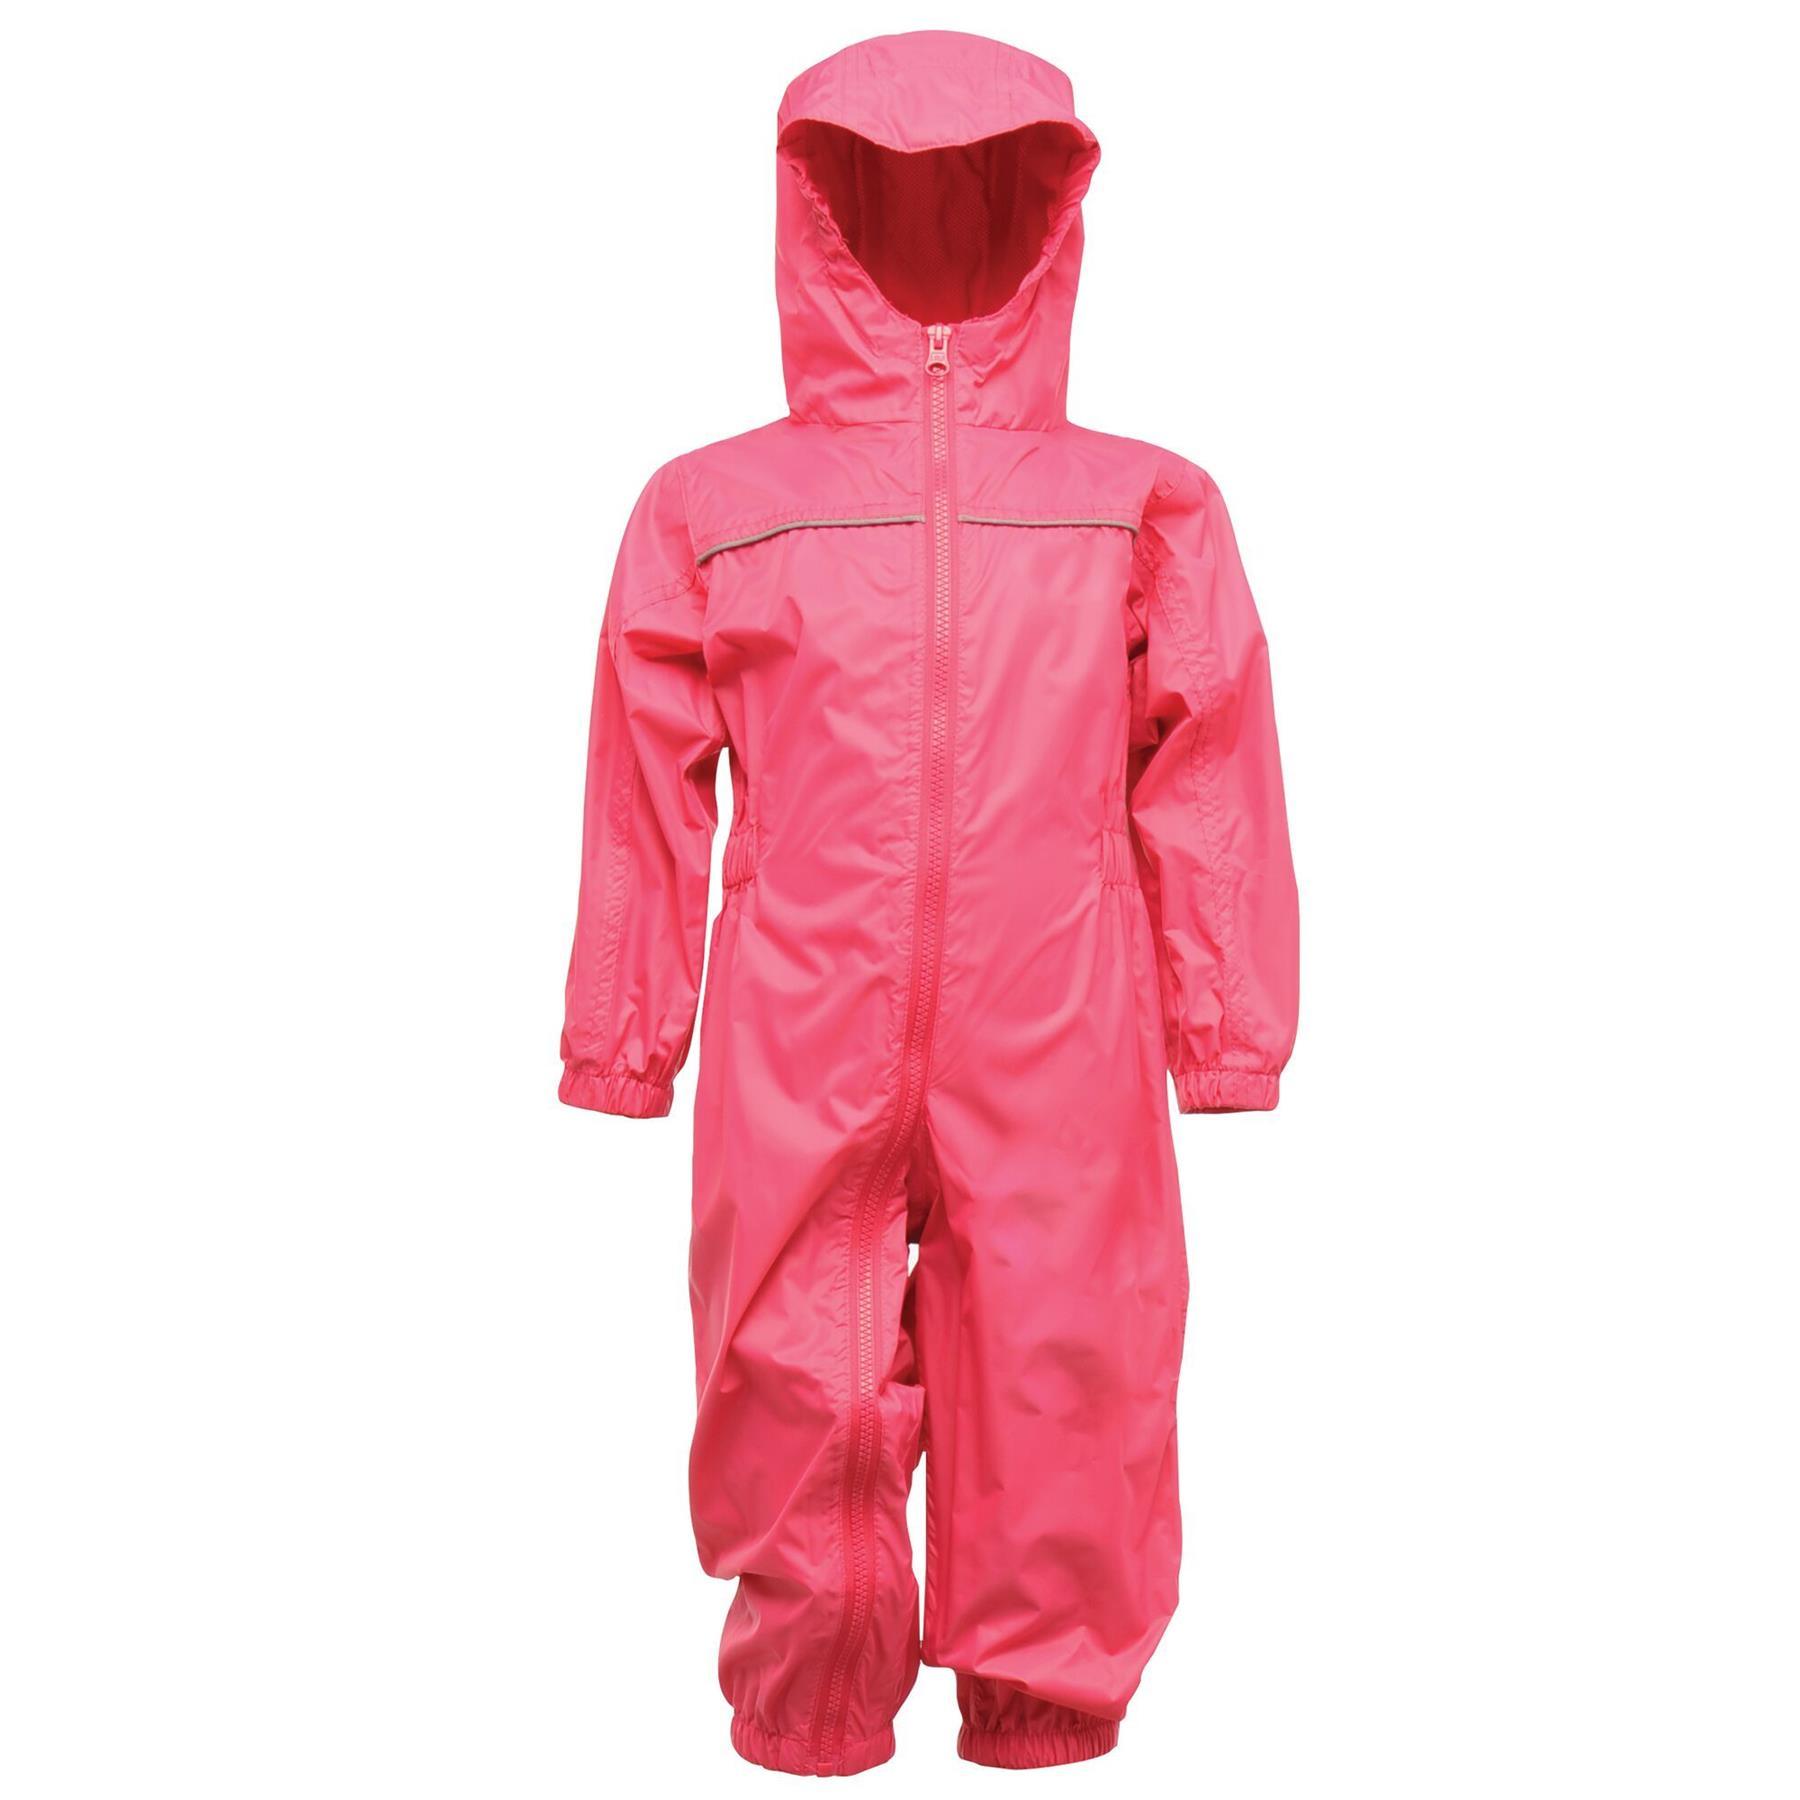 miniatuur 10 - Regatta Kids Rain Suit Puddle Paddle Boys Girls All in One Splash Waterproof